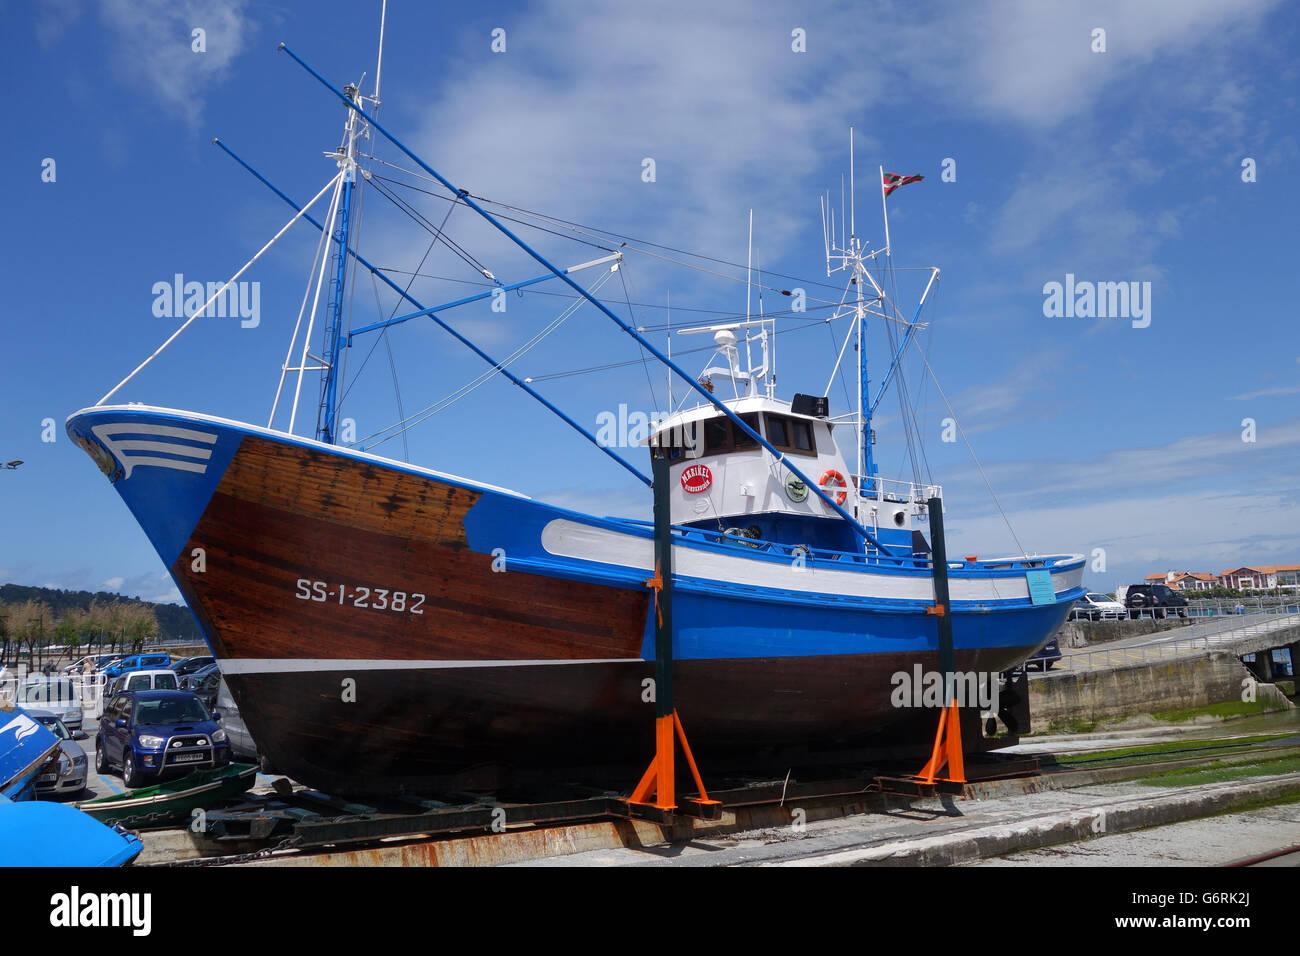 Thunfischfang Boot Schiff Schiff im Trockendock in Hondarribia in Gipuzkoa, Baskenland, Spanien Stockbild